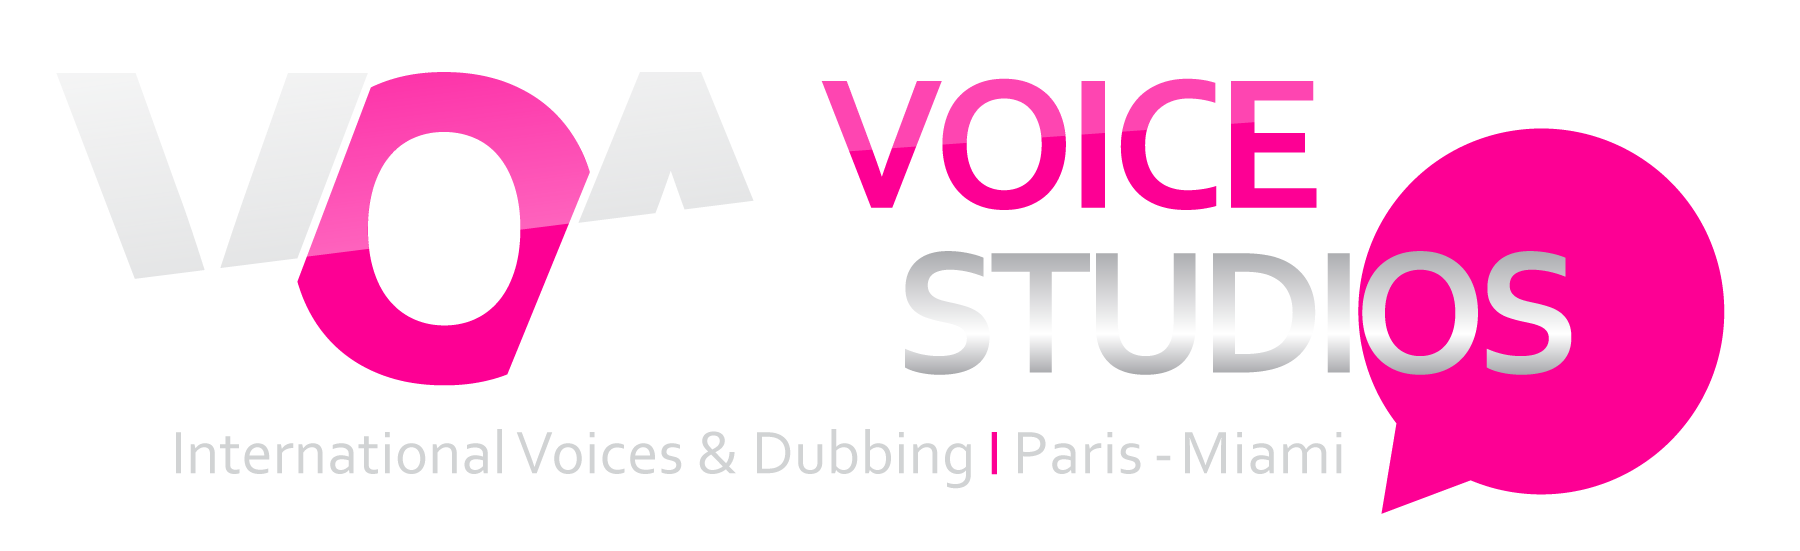 VOA VOICE STUDIOS – Voice Over Casting & Recording